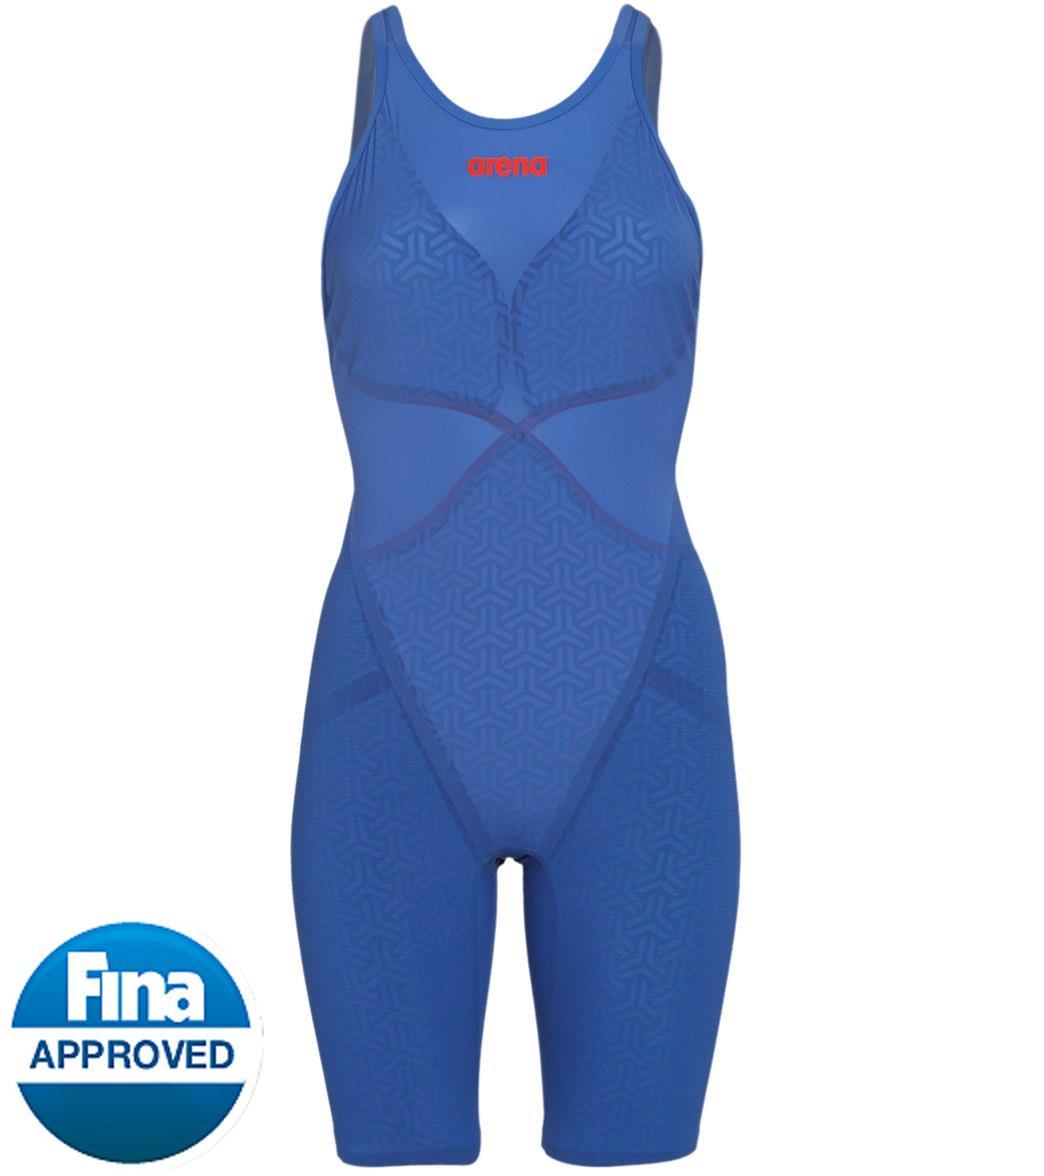 Arena Women's Powerskin Carbon Glide Closed Back Tech Suit Swimsuit